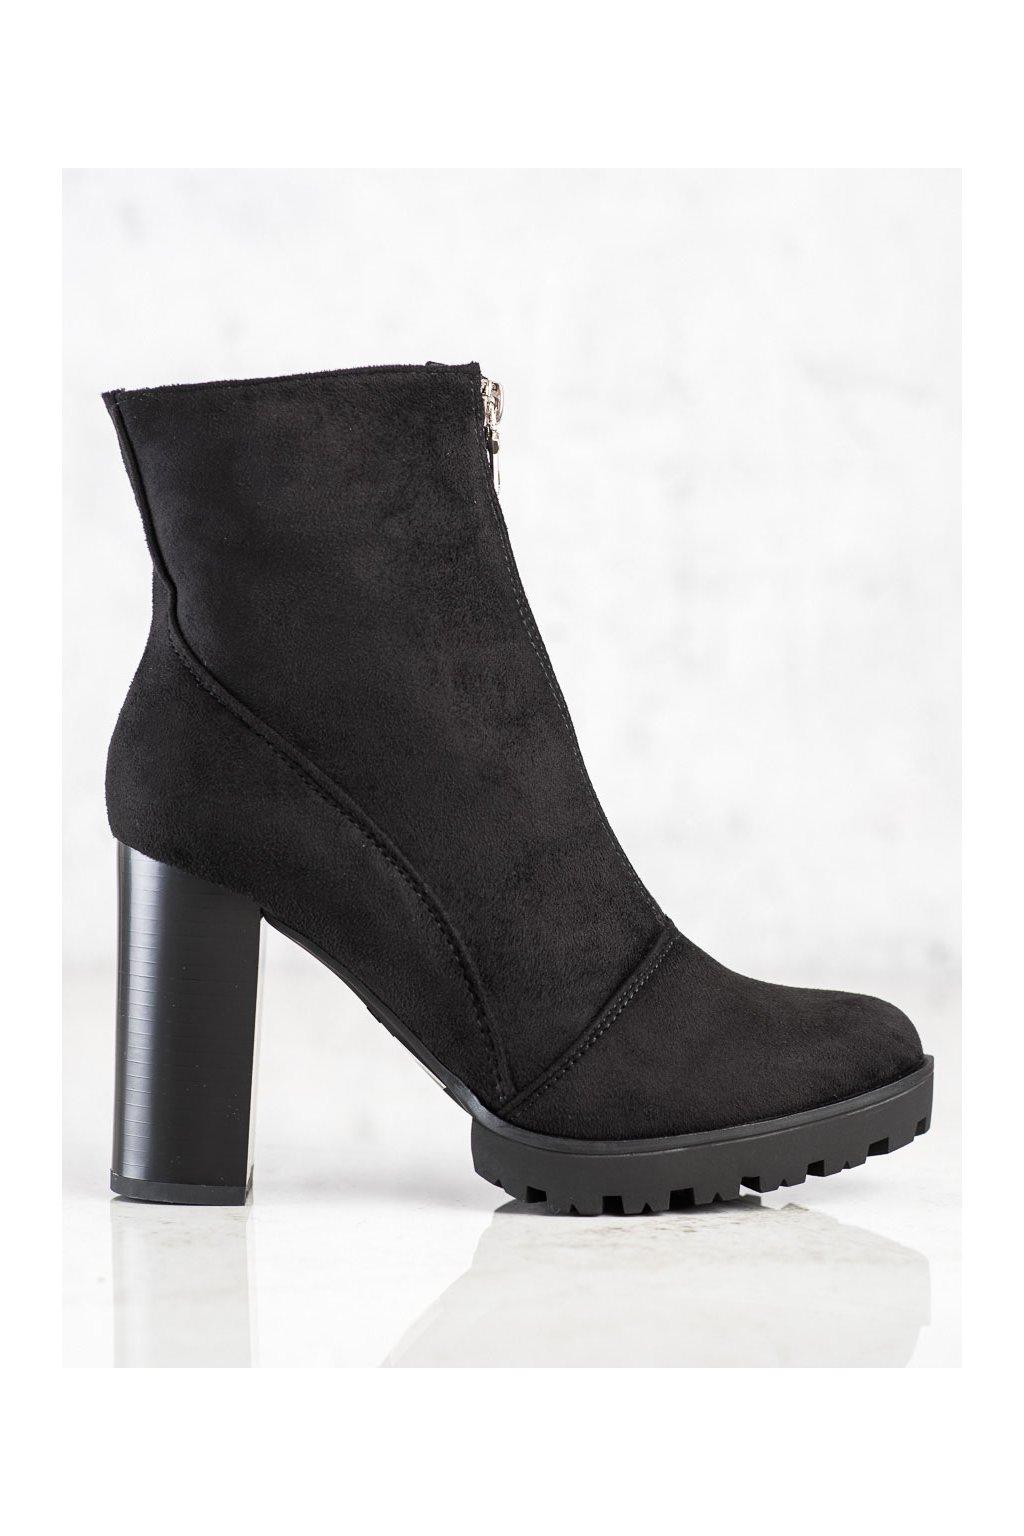 Čierne dámske topánky Cm paris kod 688-A40B